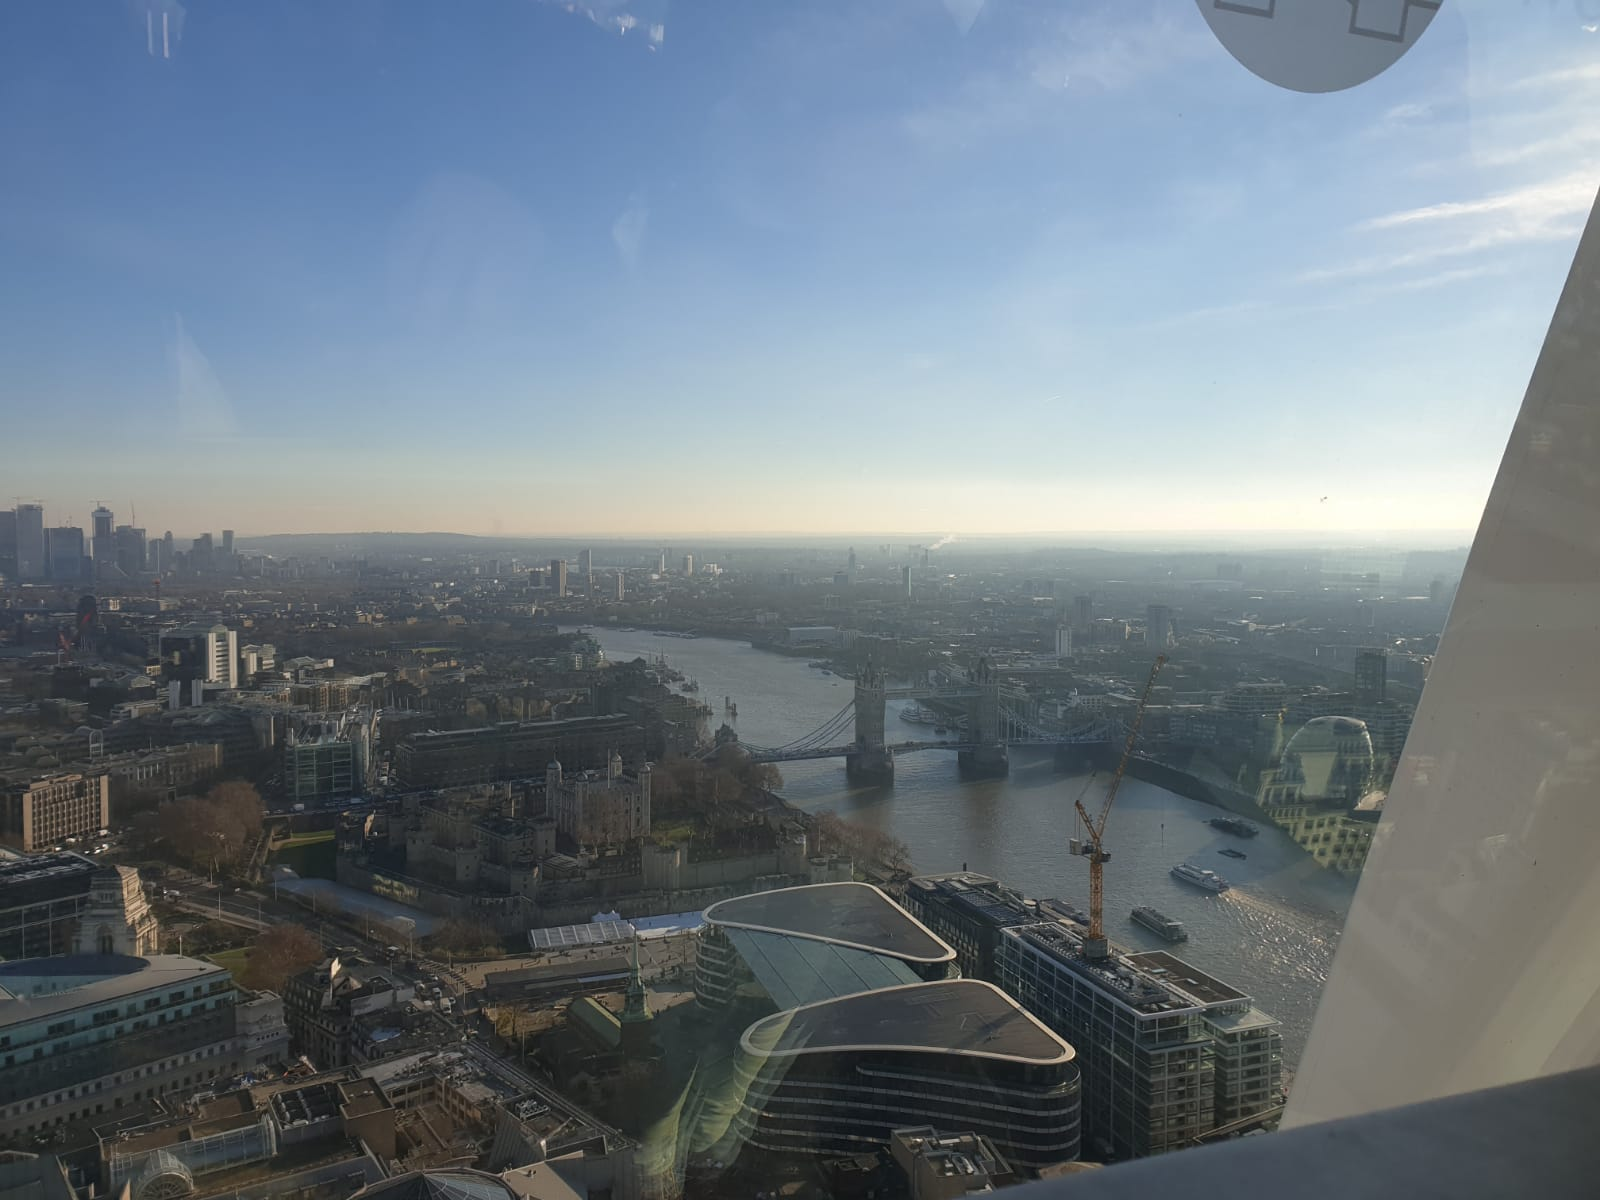 Blick auf die Towerbridge London